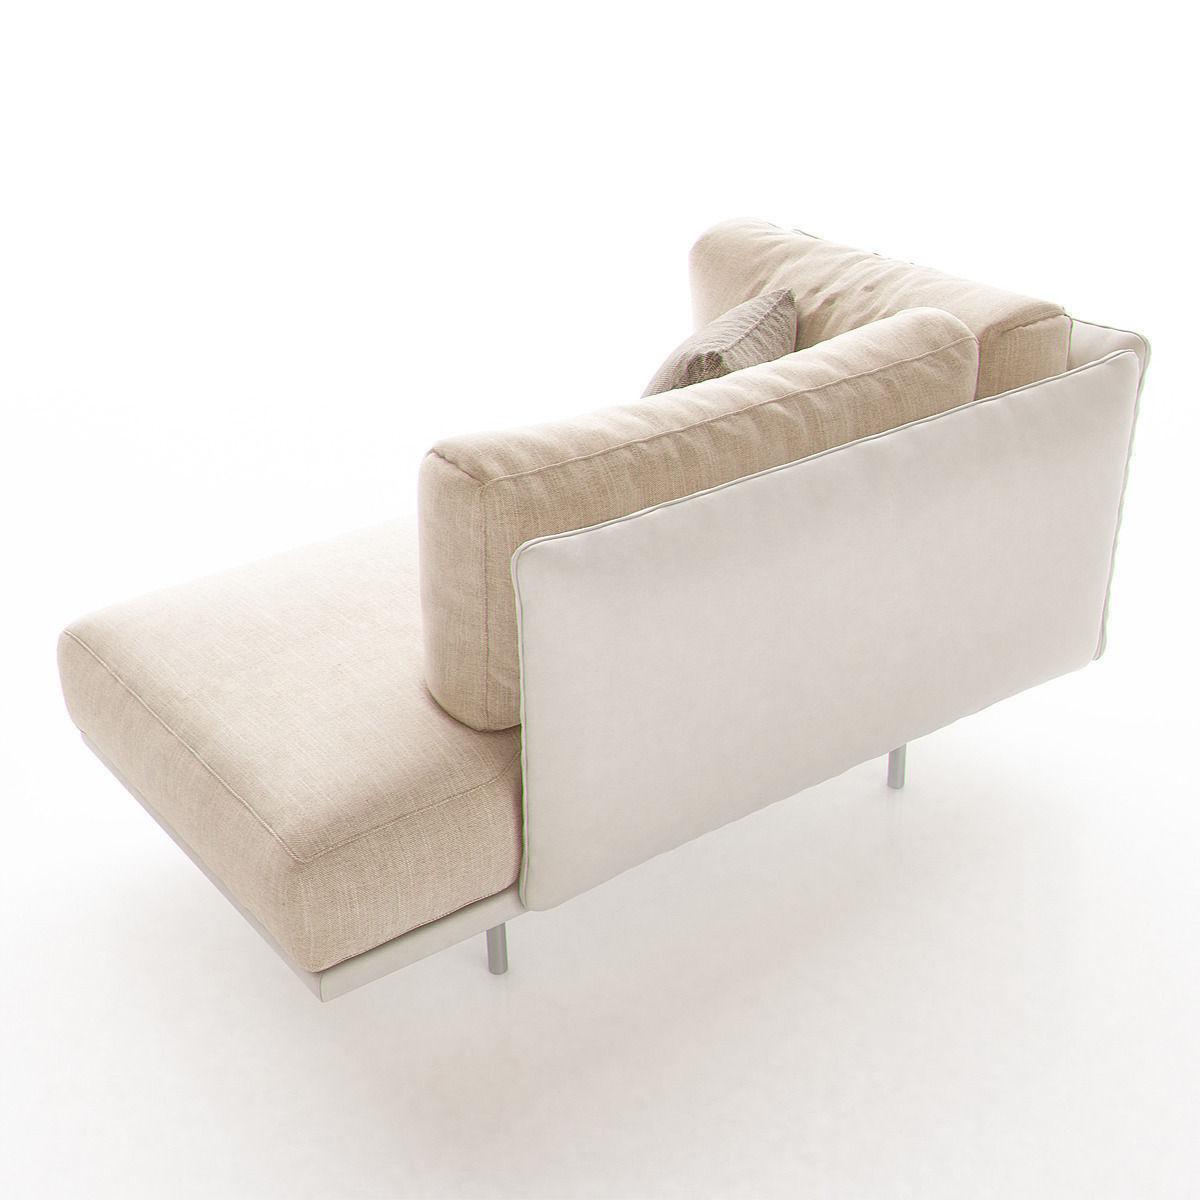 Lederman chaise lounge by arik ben simhon 3d model max obj for Chaise modele